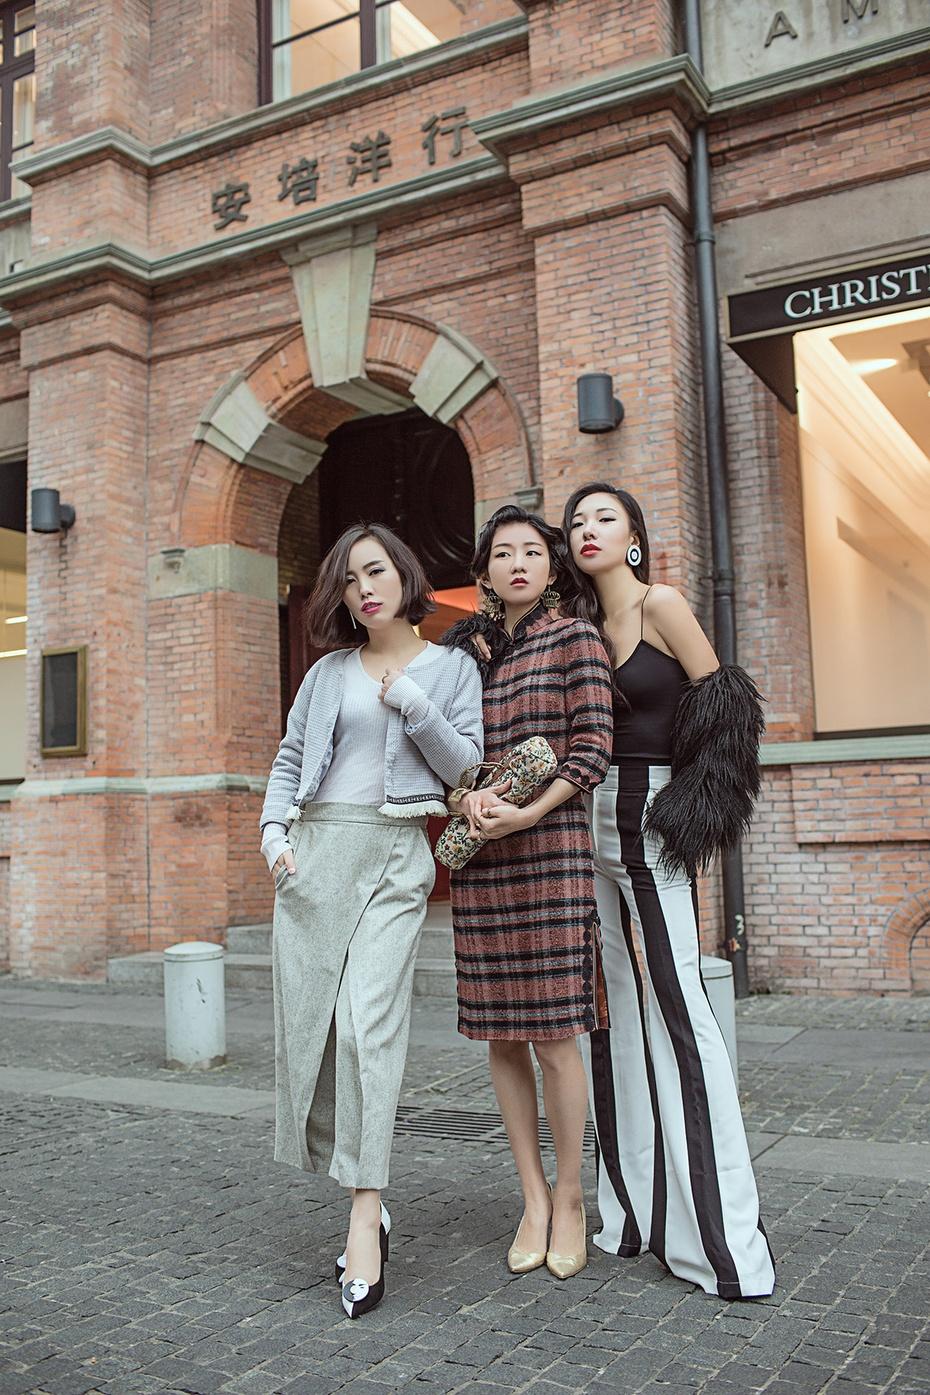 [Ava搭配周记]最美不过旗袍 - AvaFoo - Avas Fashion Blog